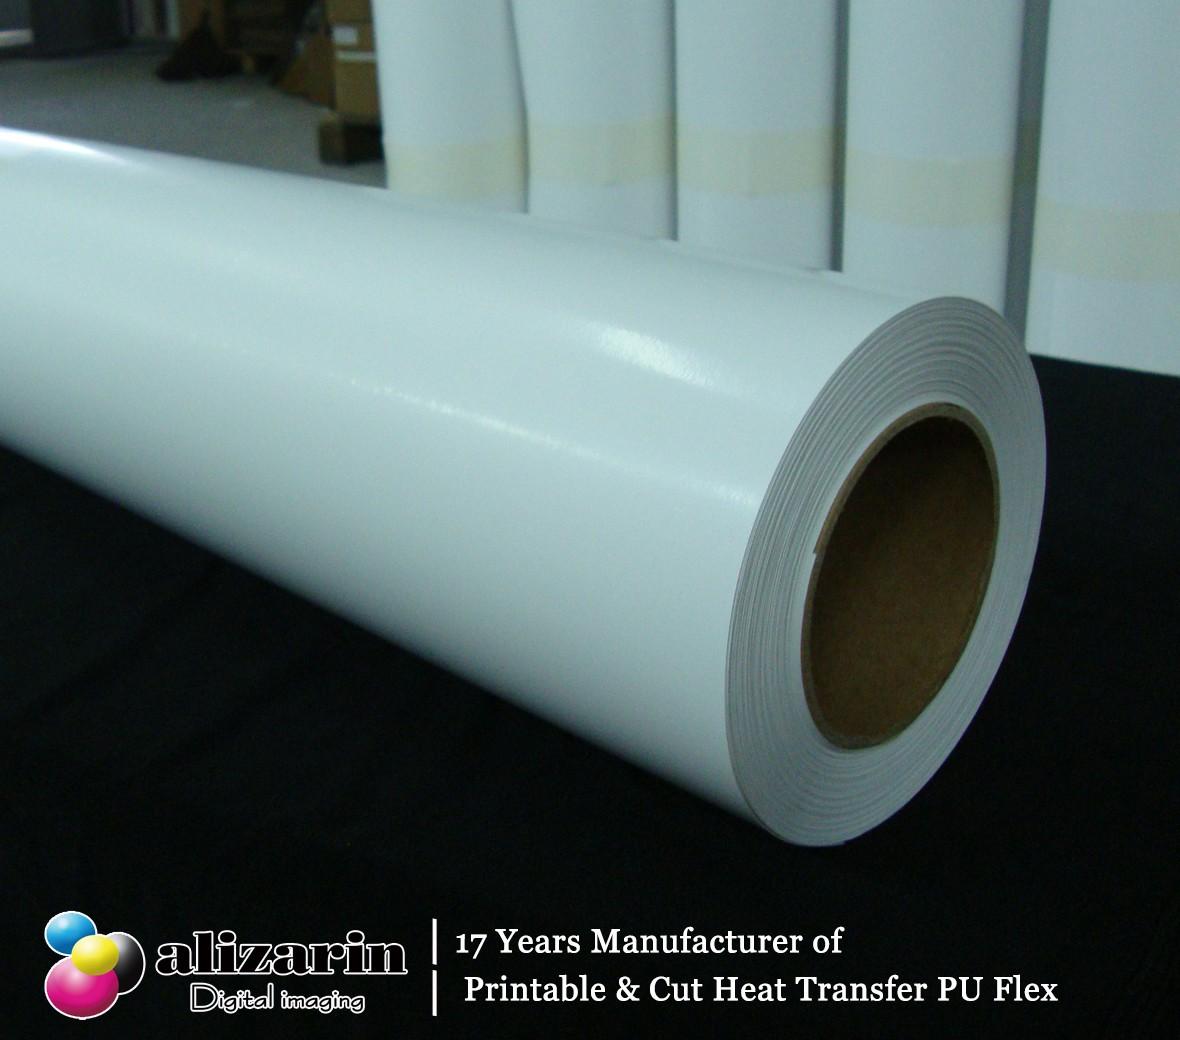 Eco-solvent Dark Printable PU Flex